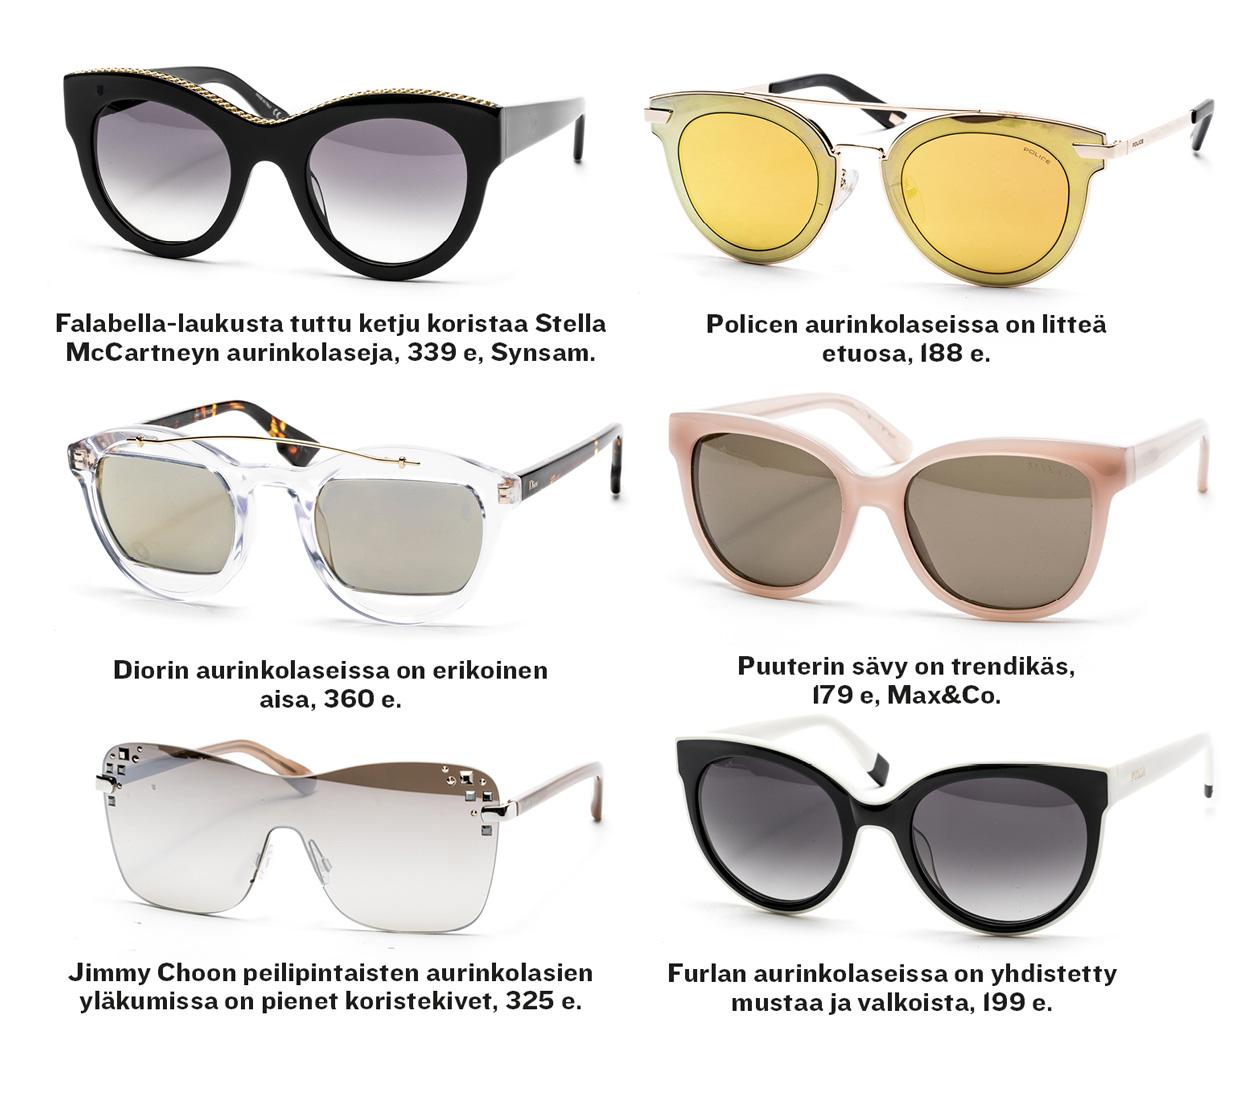 Tiedustelut  Calvin Klein Scandinavian Eyewear 09 502 1033 2d0581e910